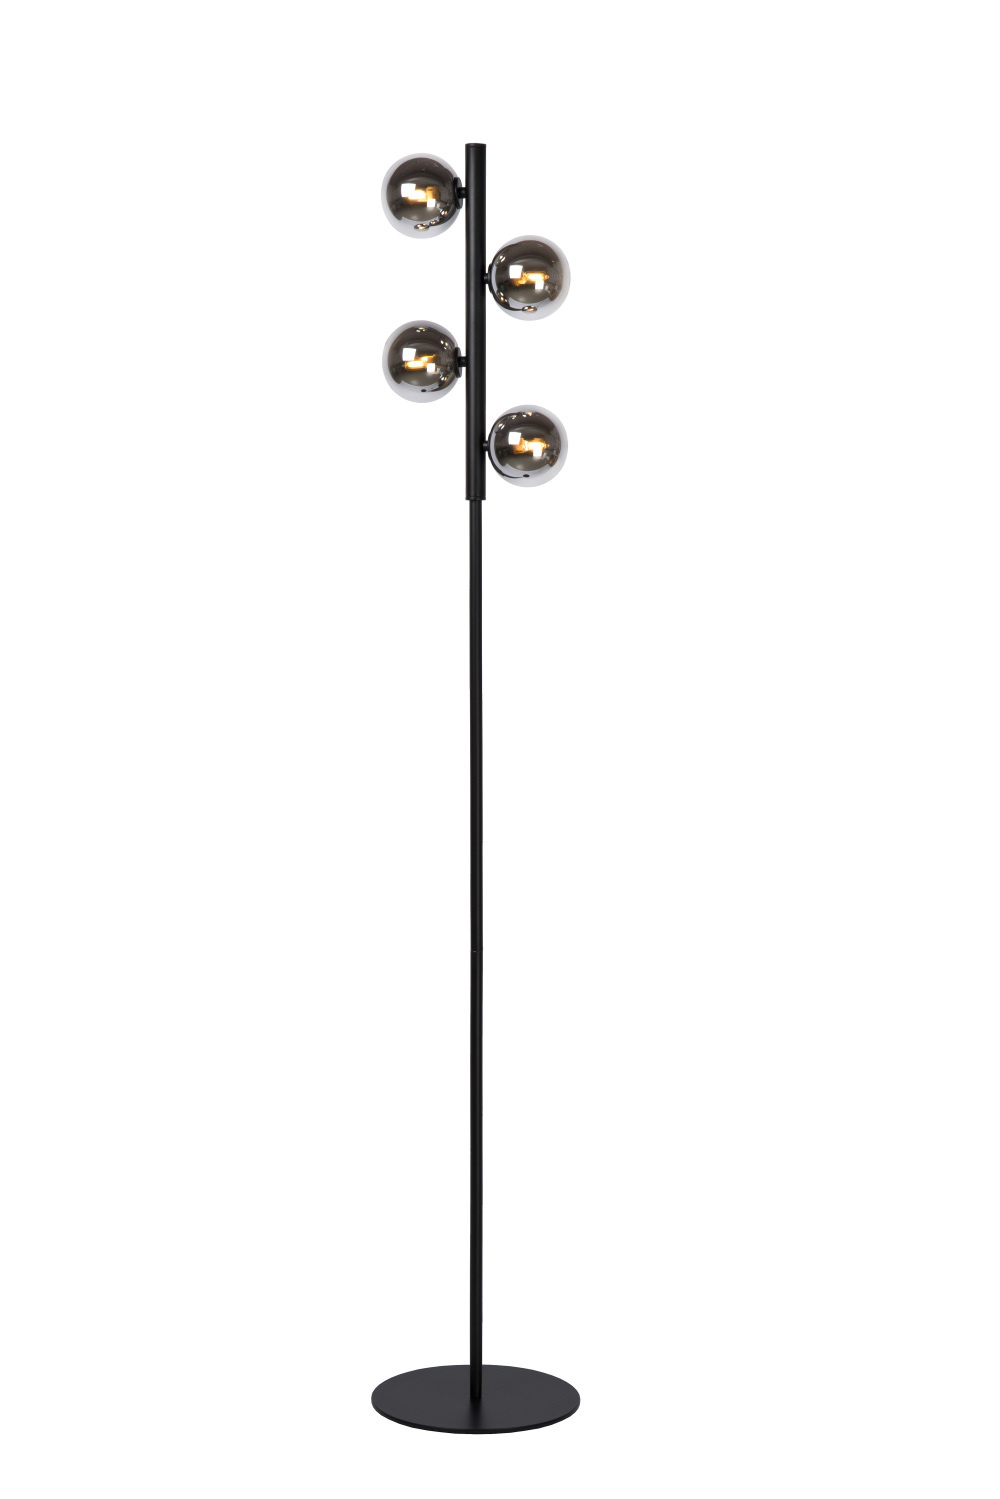 Lucide Tycho Vloerlamp 4xg9 28w Zwart